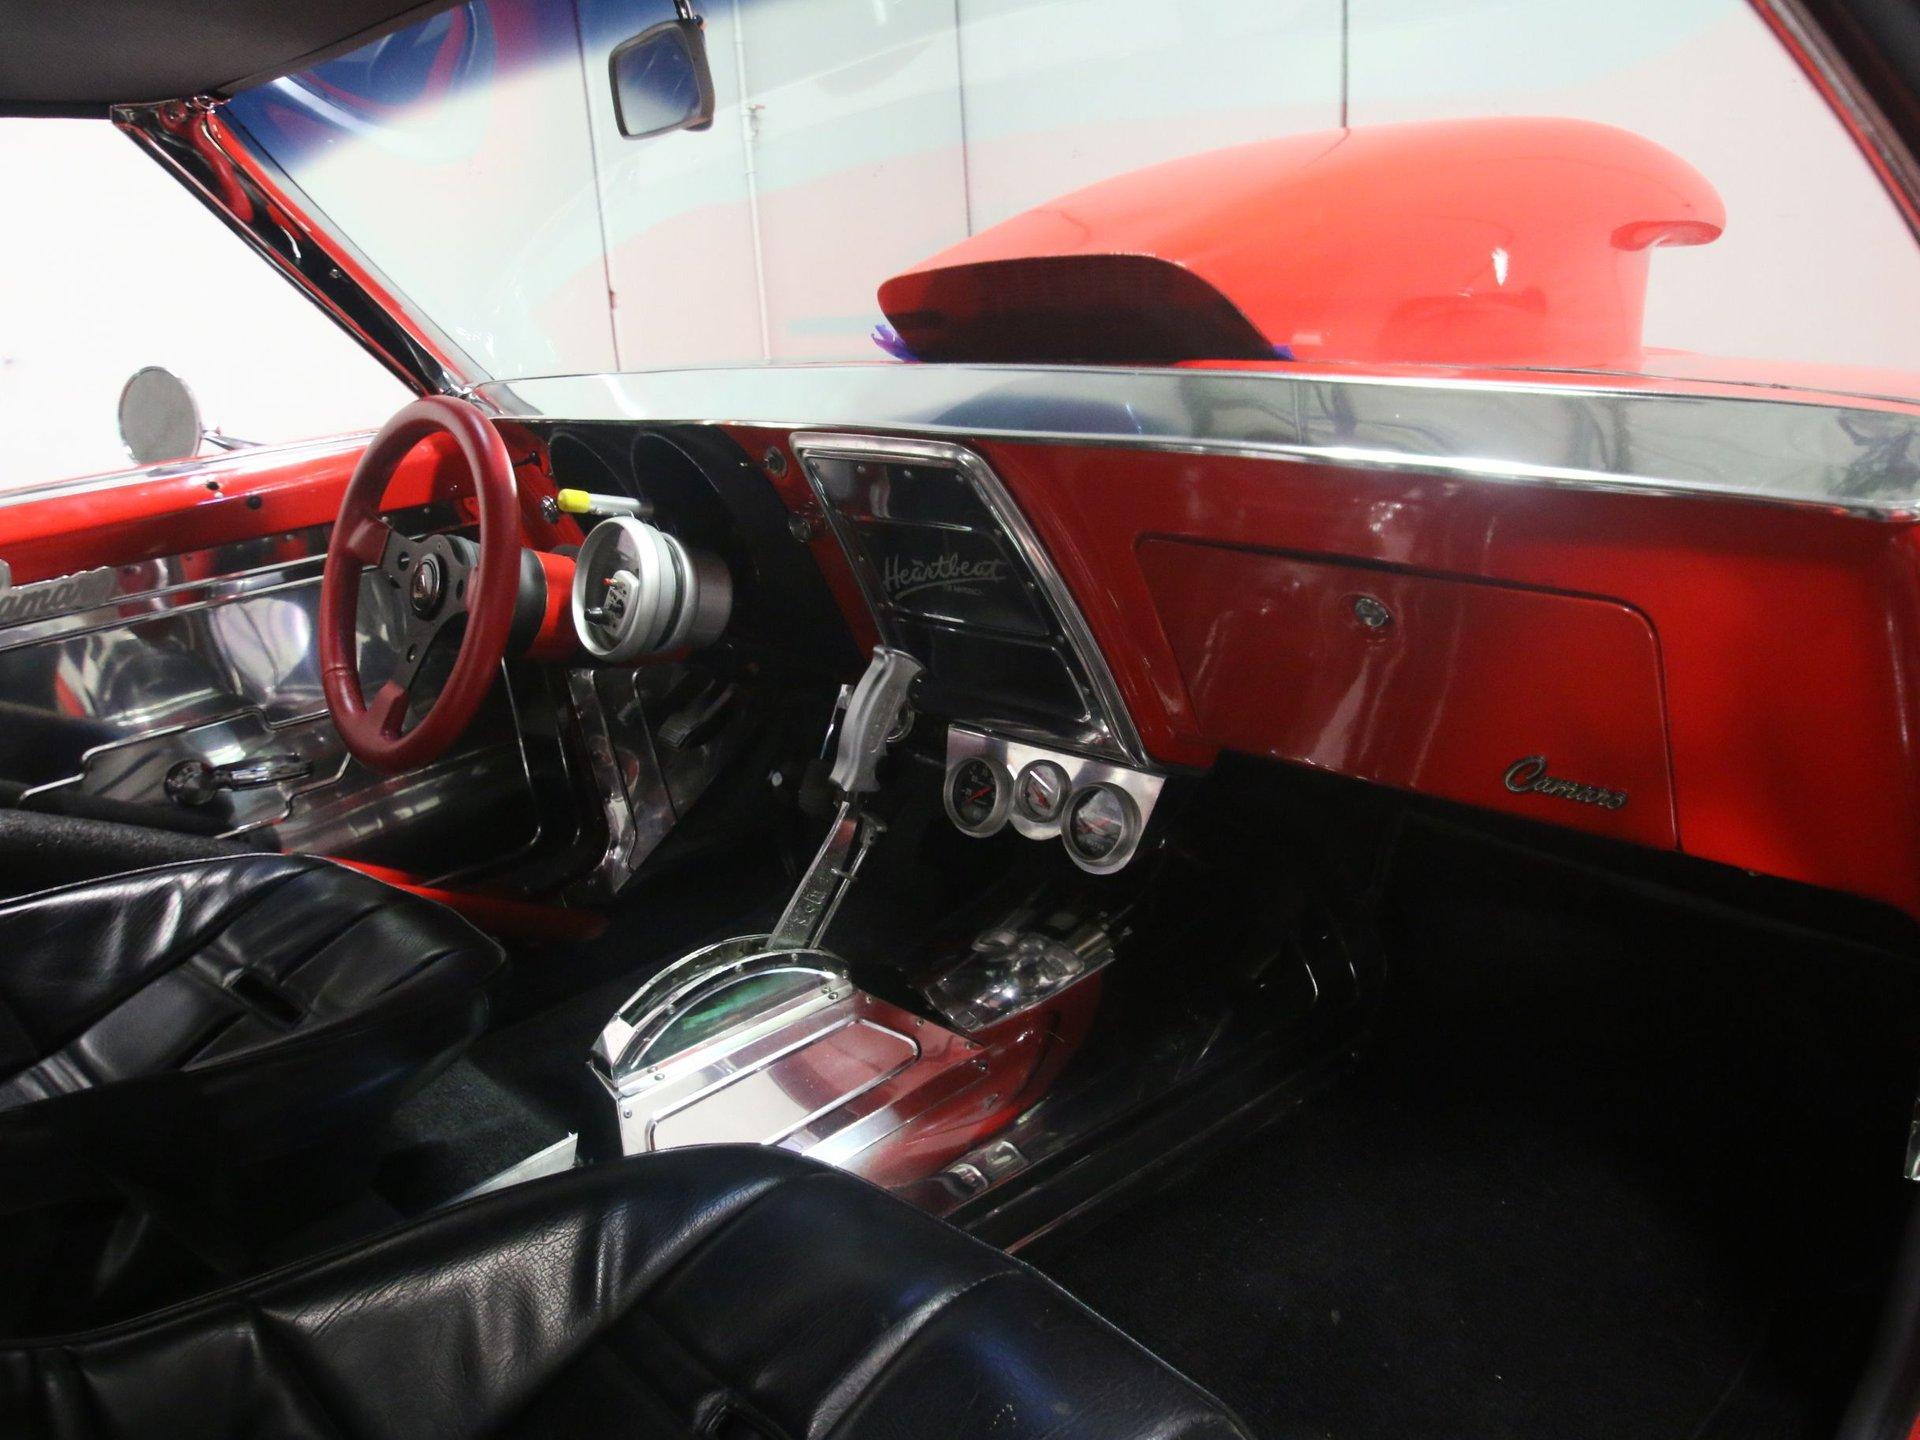 1967 Chevrolet Camaro Prostreet for sale #50642 | MCG